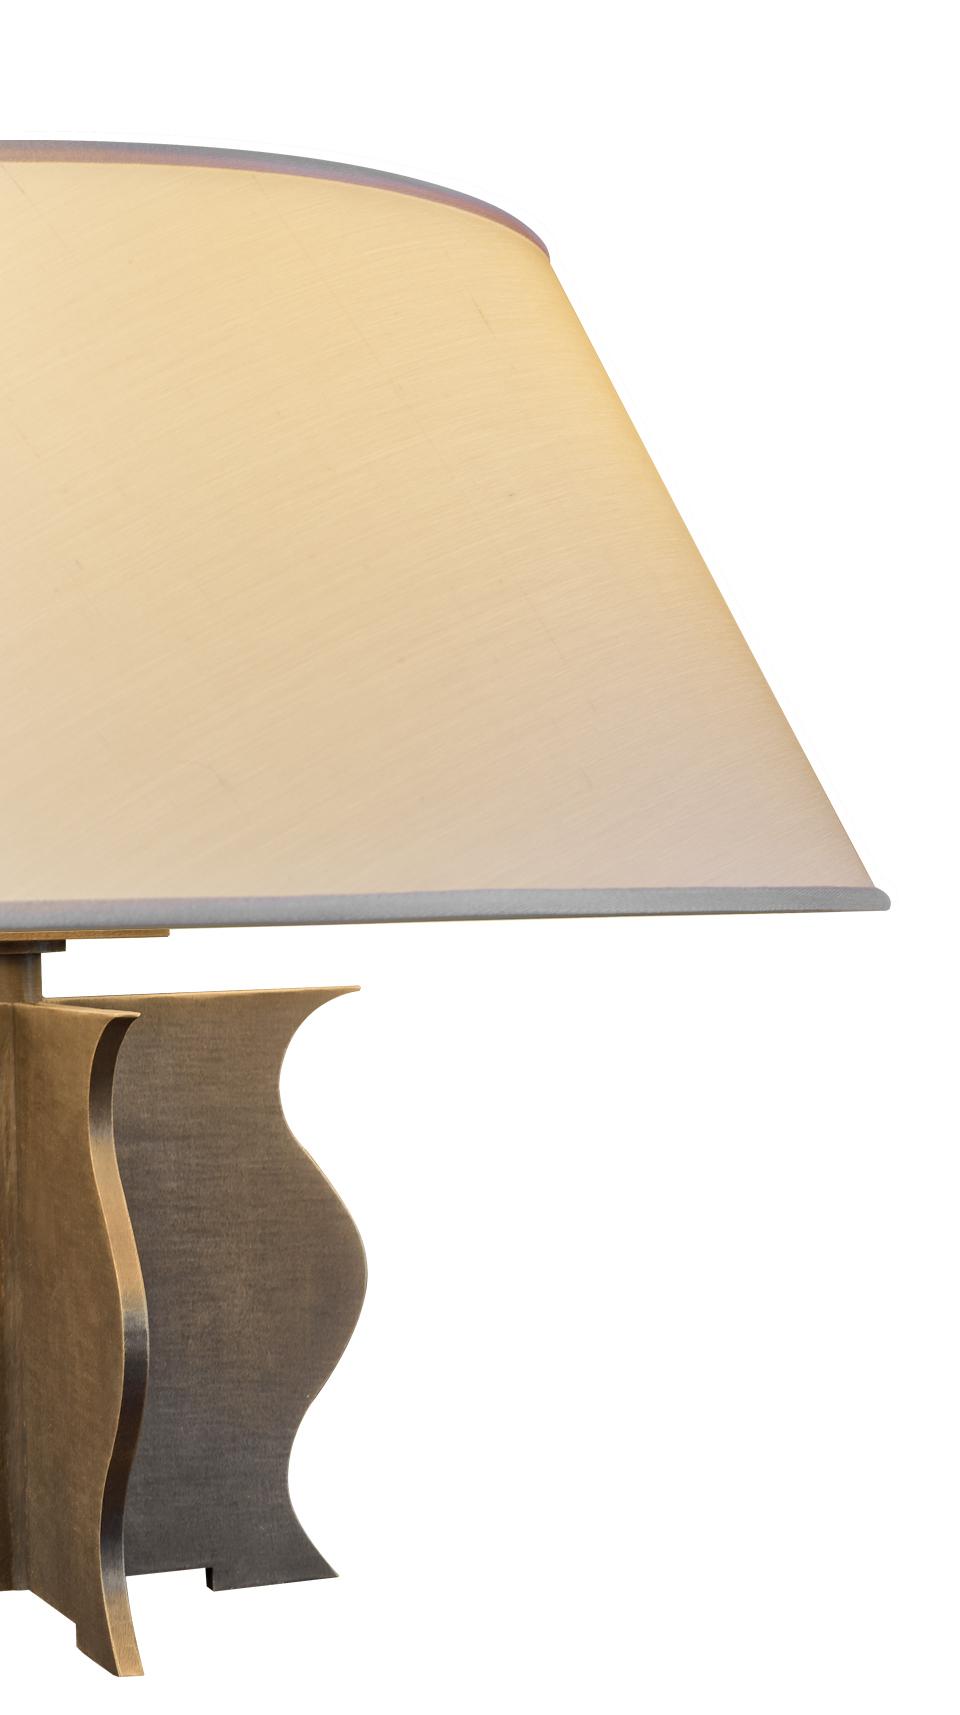 Lillì LED台灯兼床头灯采用锤纹铜质结构和亚克力灯光漫射器,灯罩以亚麻、纯棉面料或手工刺绣丝绸制成,请参见Promemoria产品目录|Promemoria